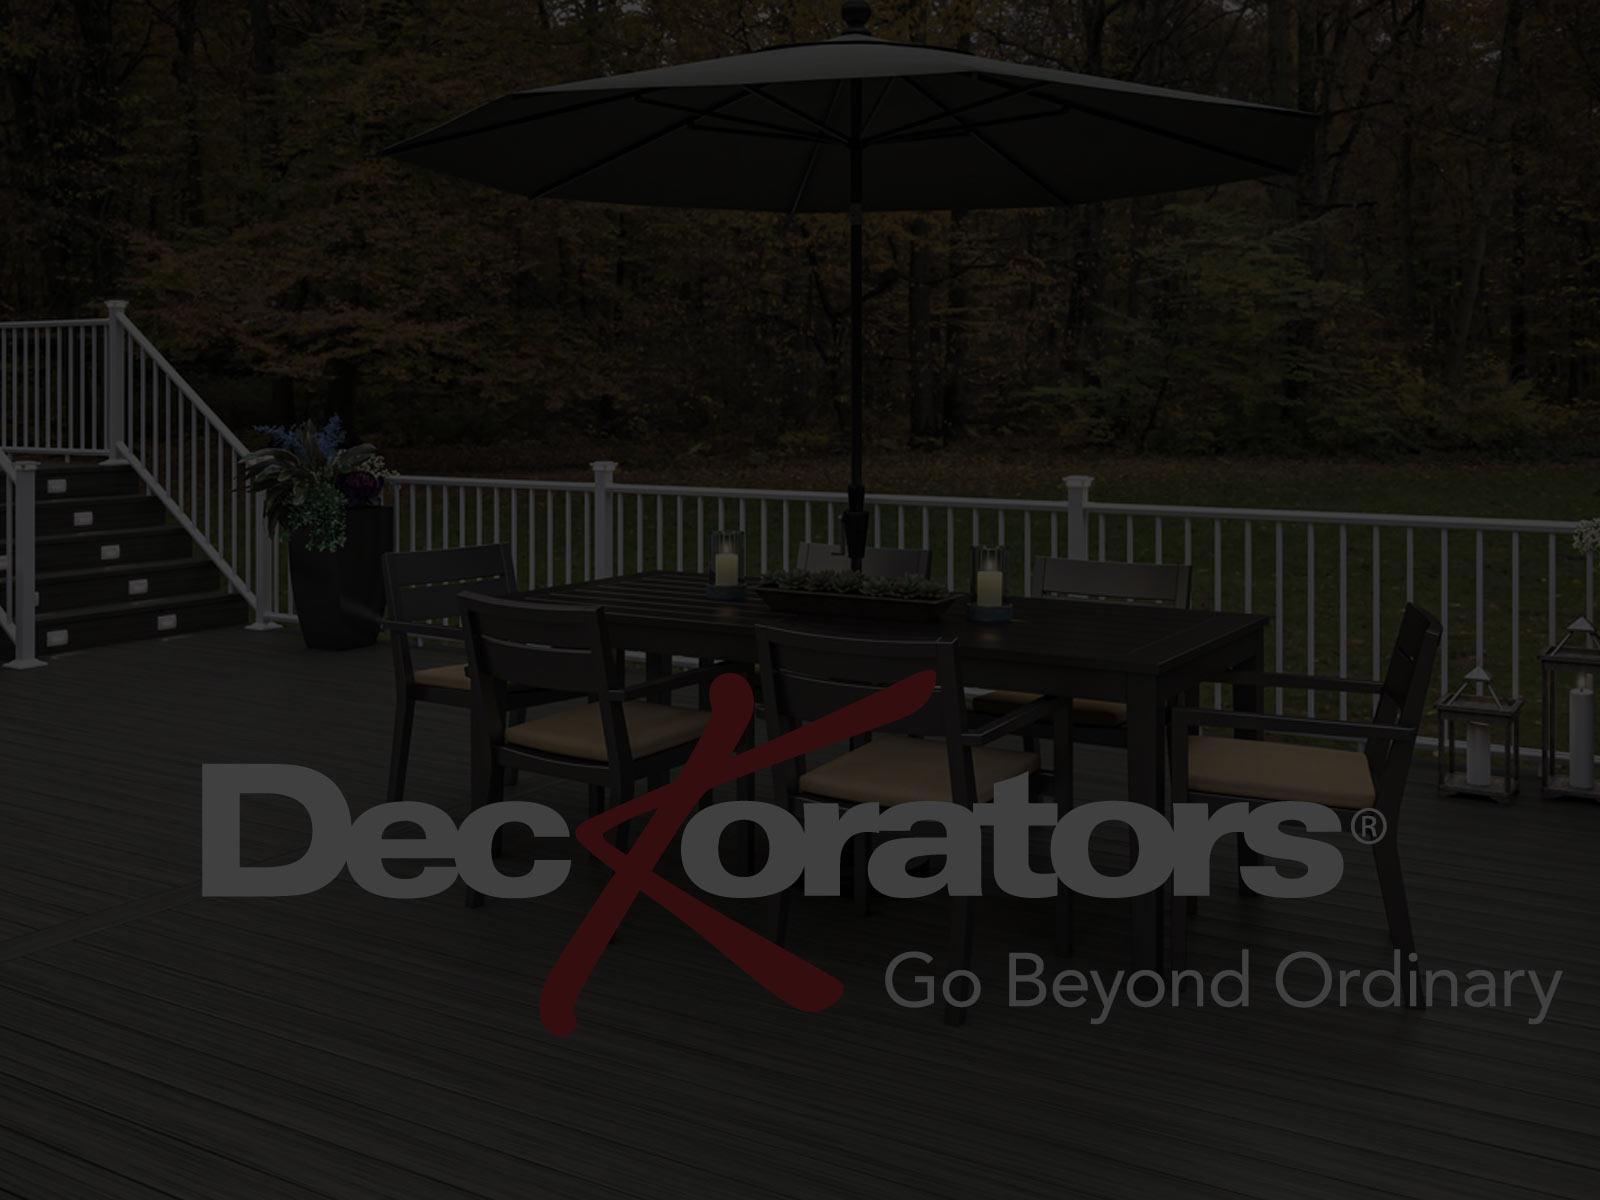 Deckorators Decking Australia